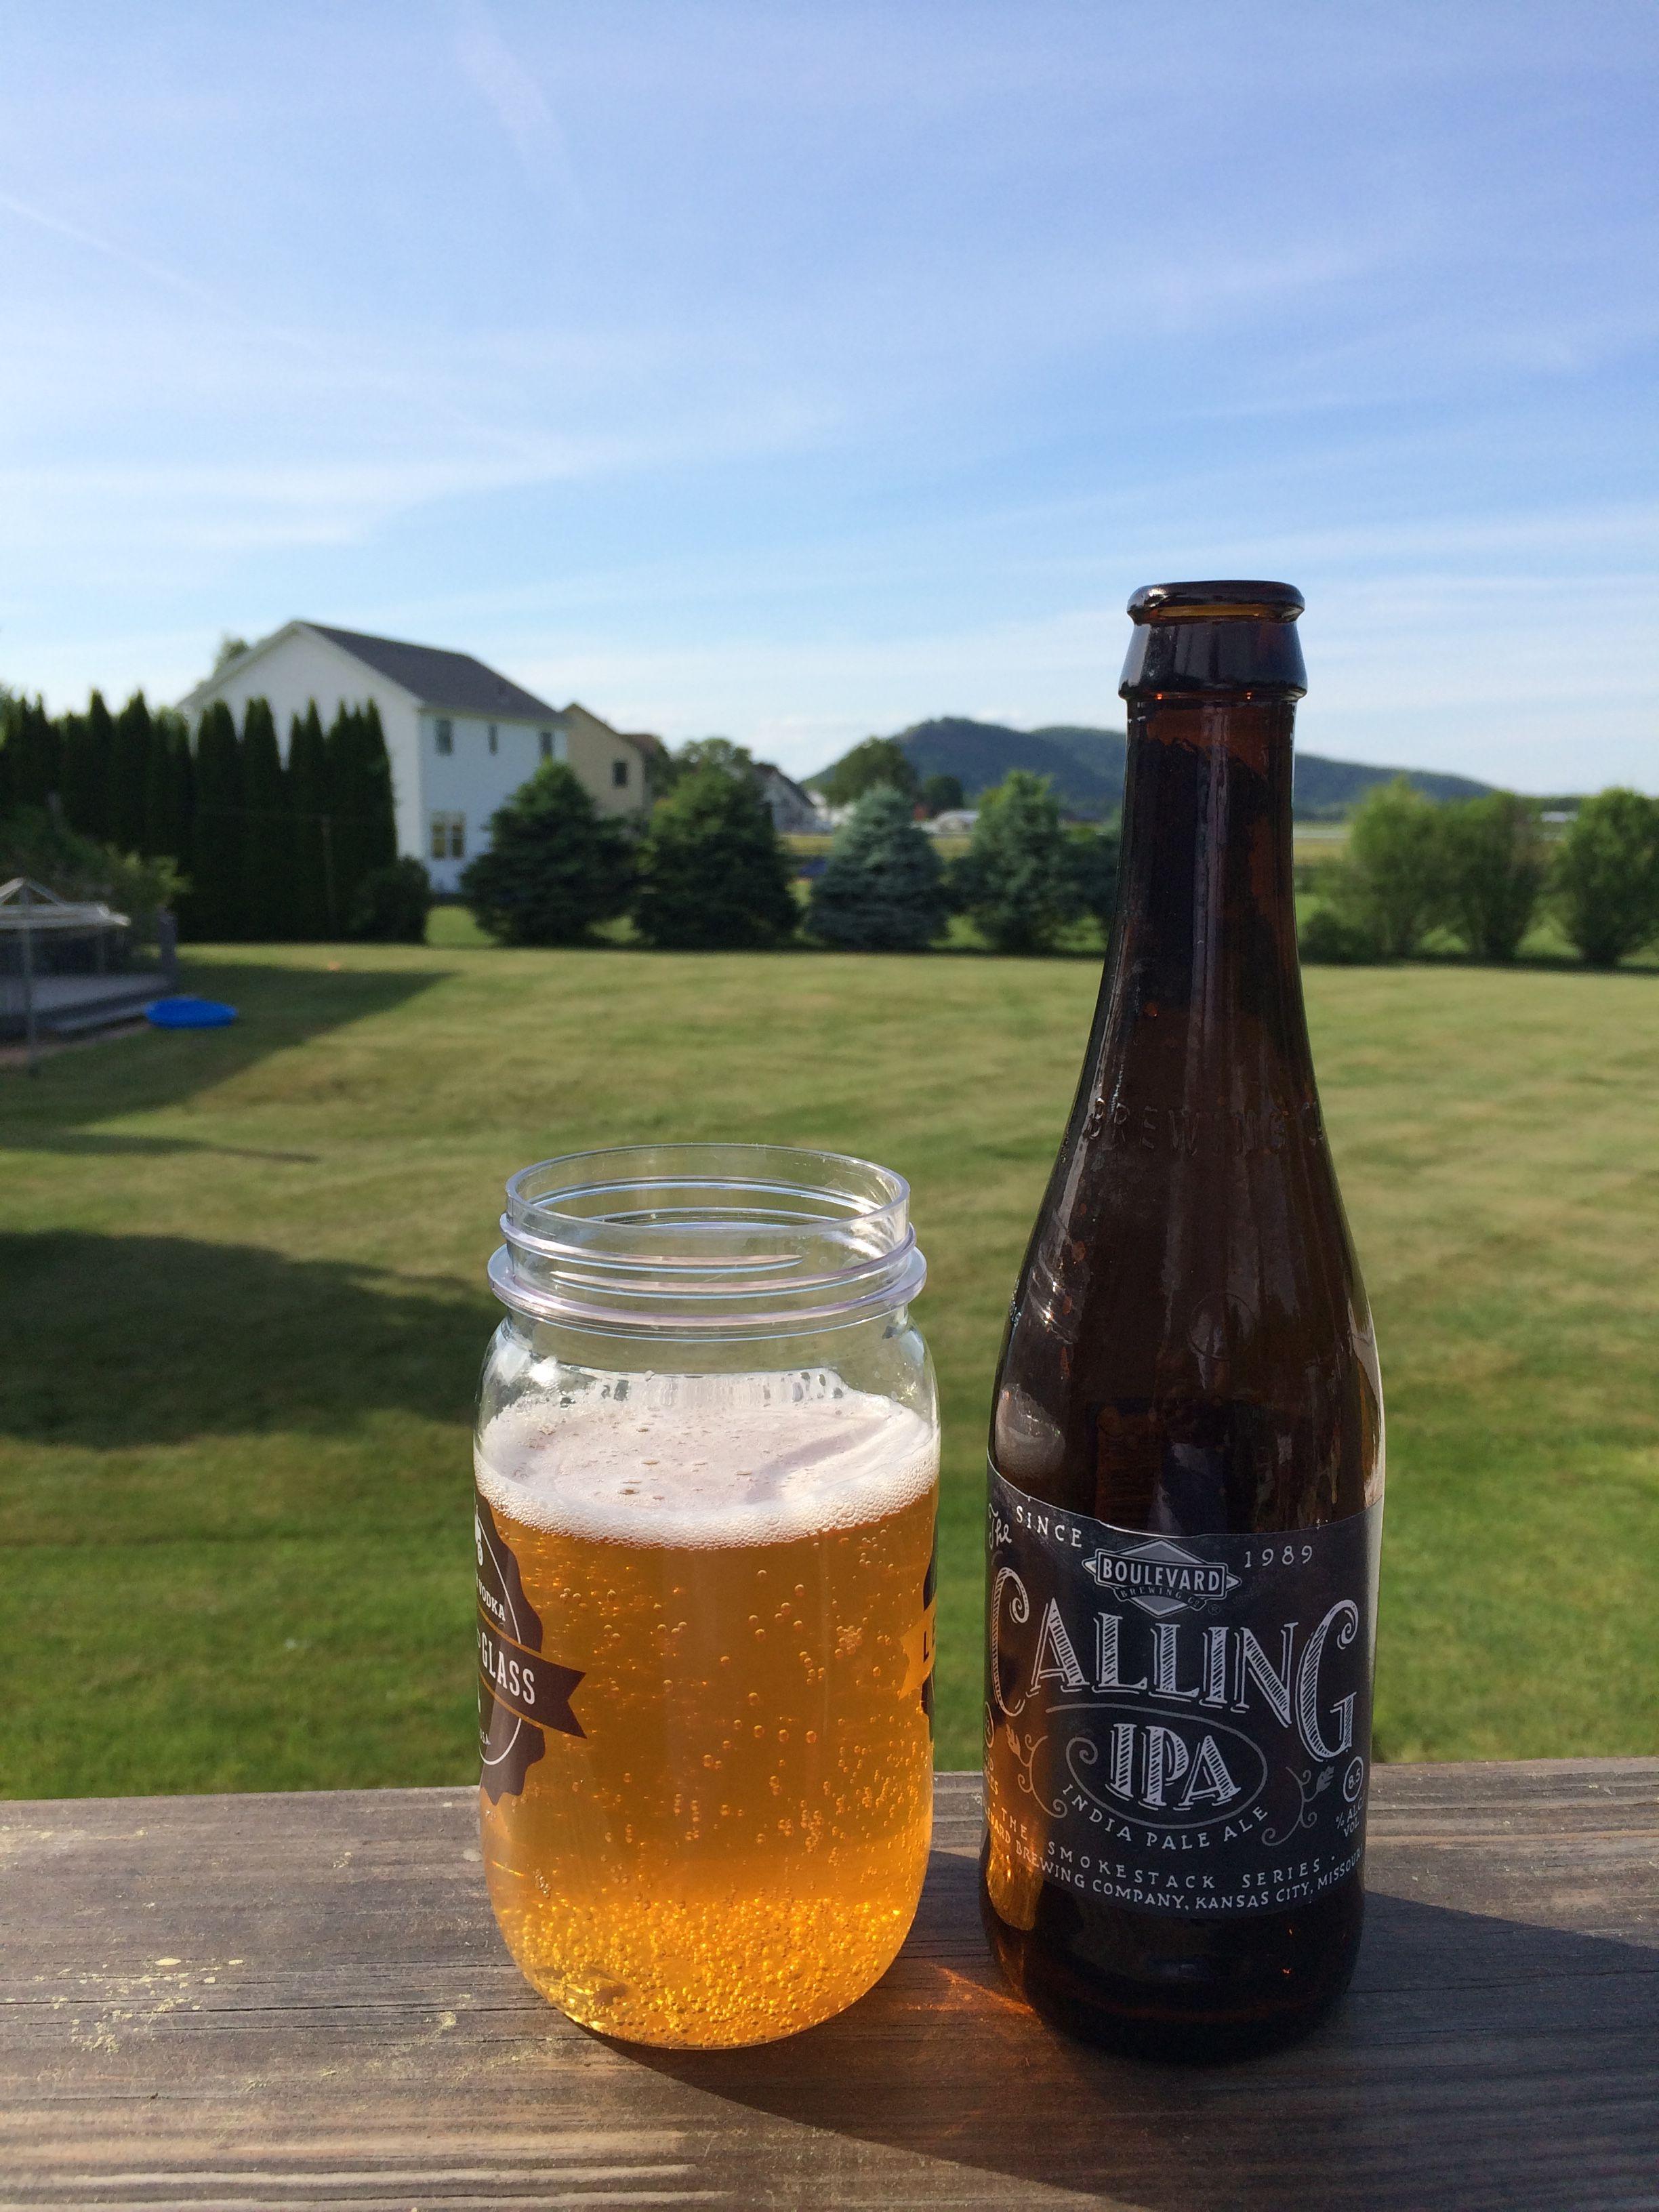 47+ Top craft breweries by volume ideas